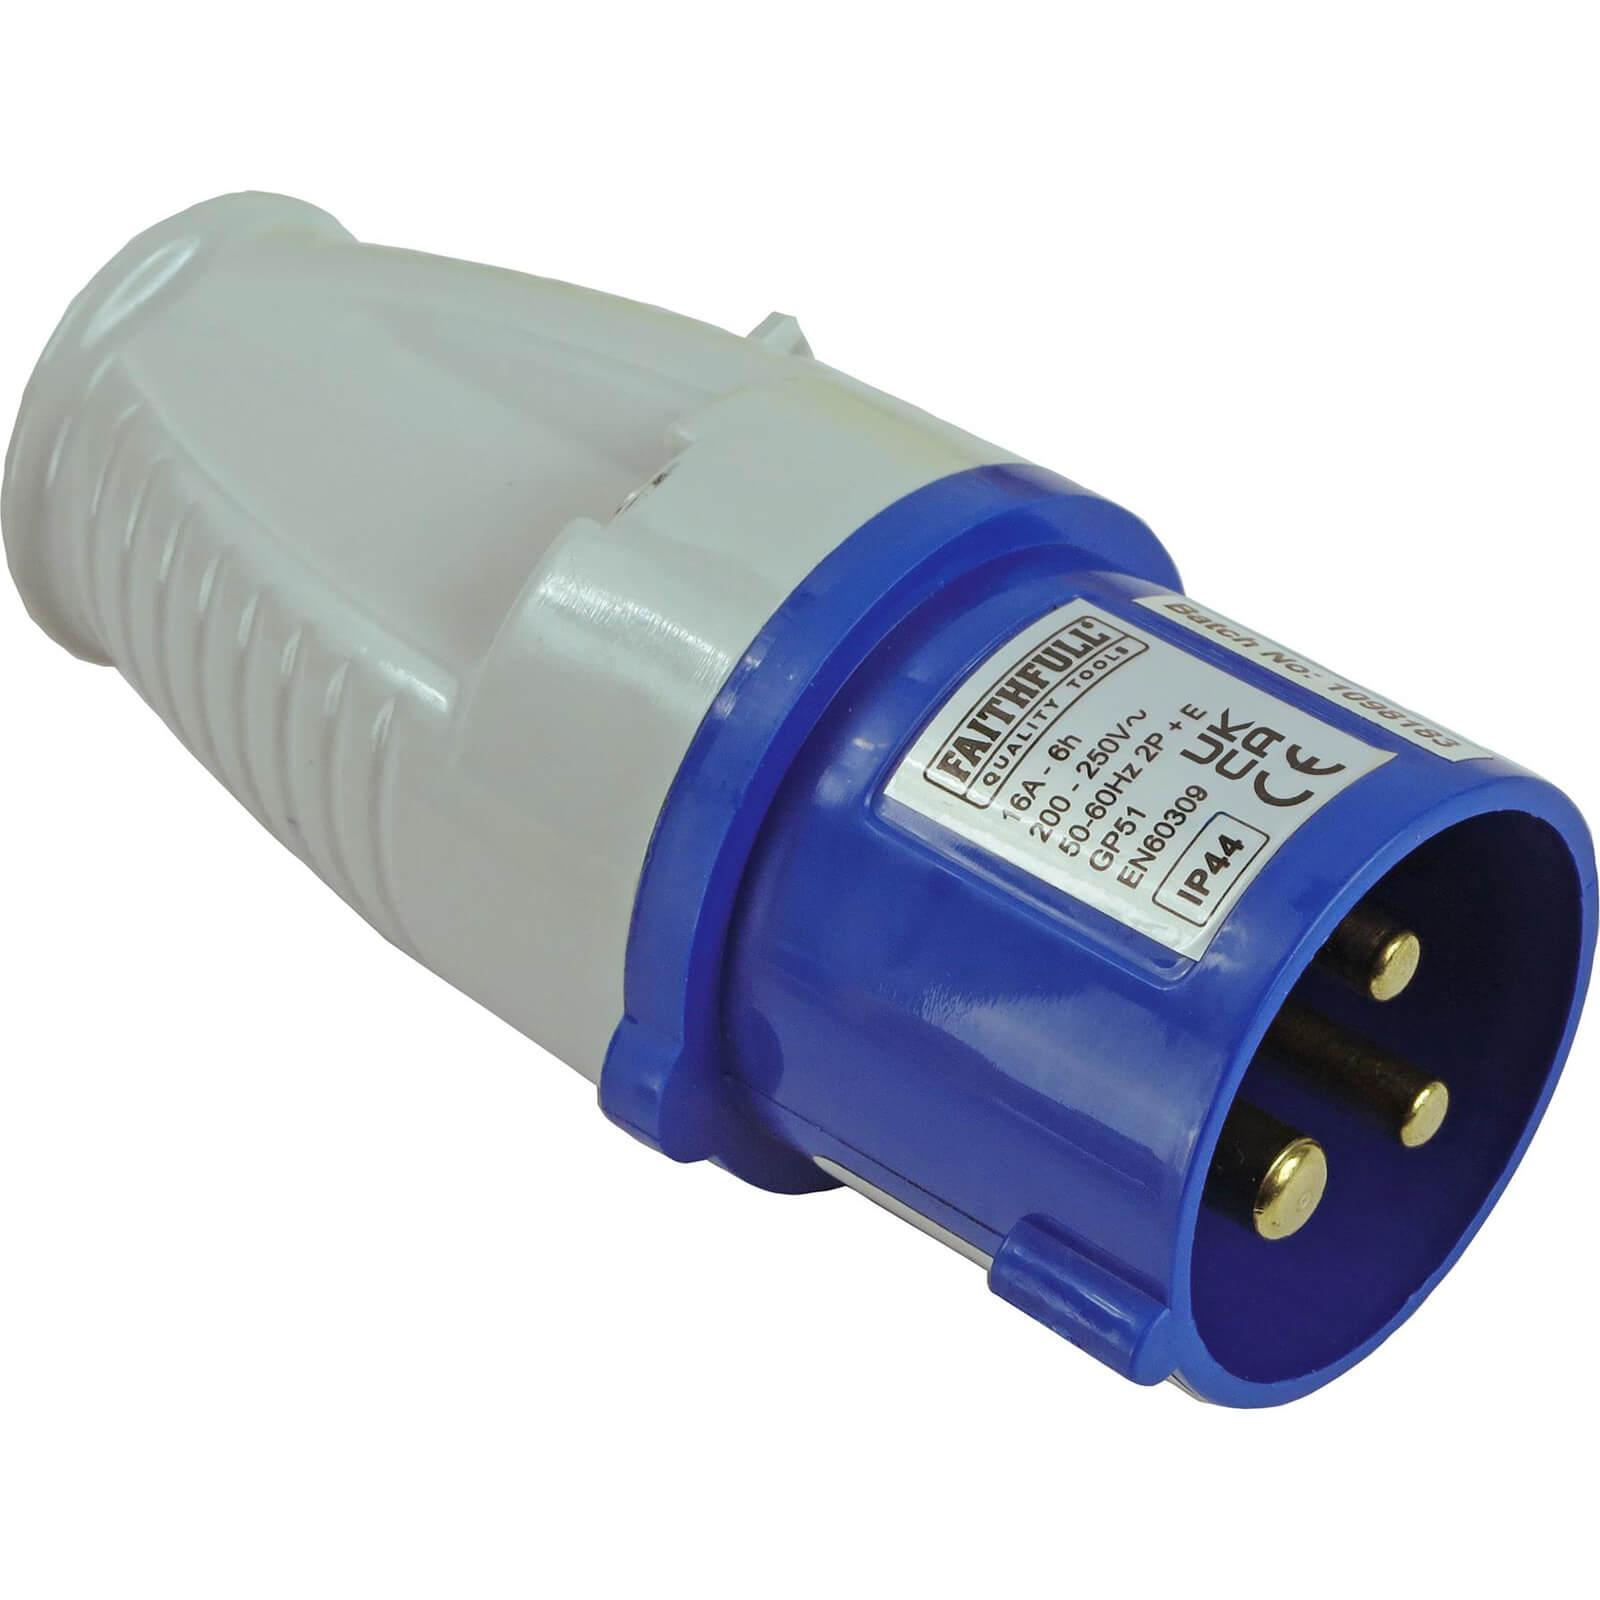 Faithfull Blue Plug 16amp 240v